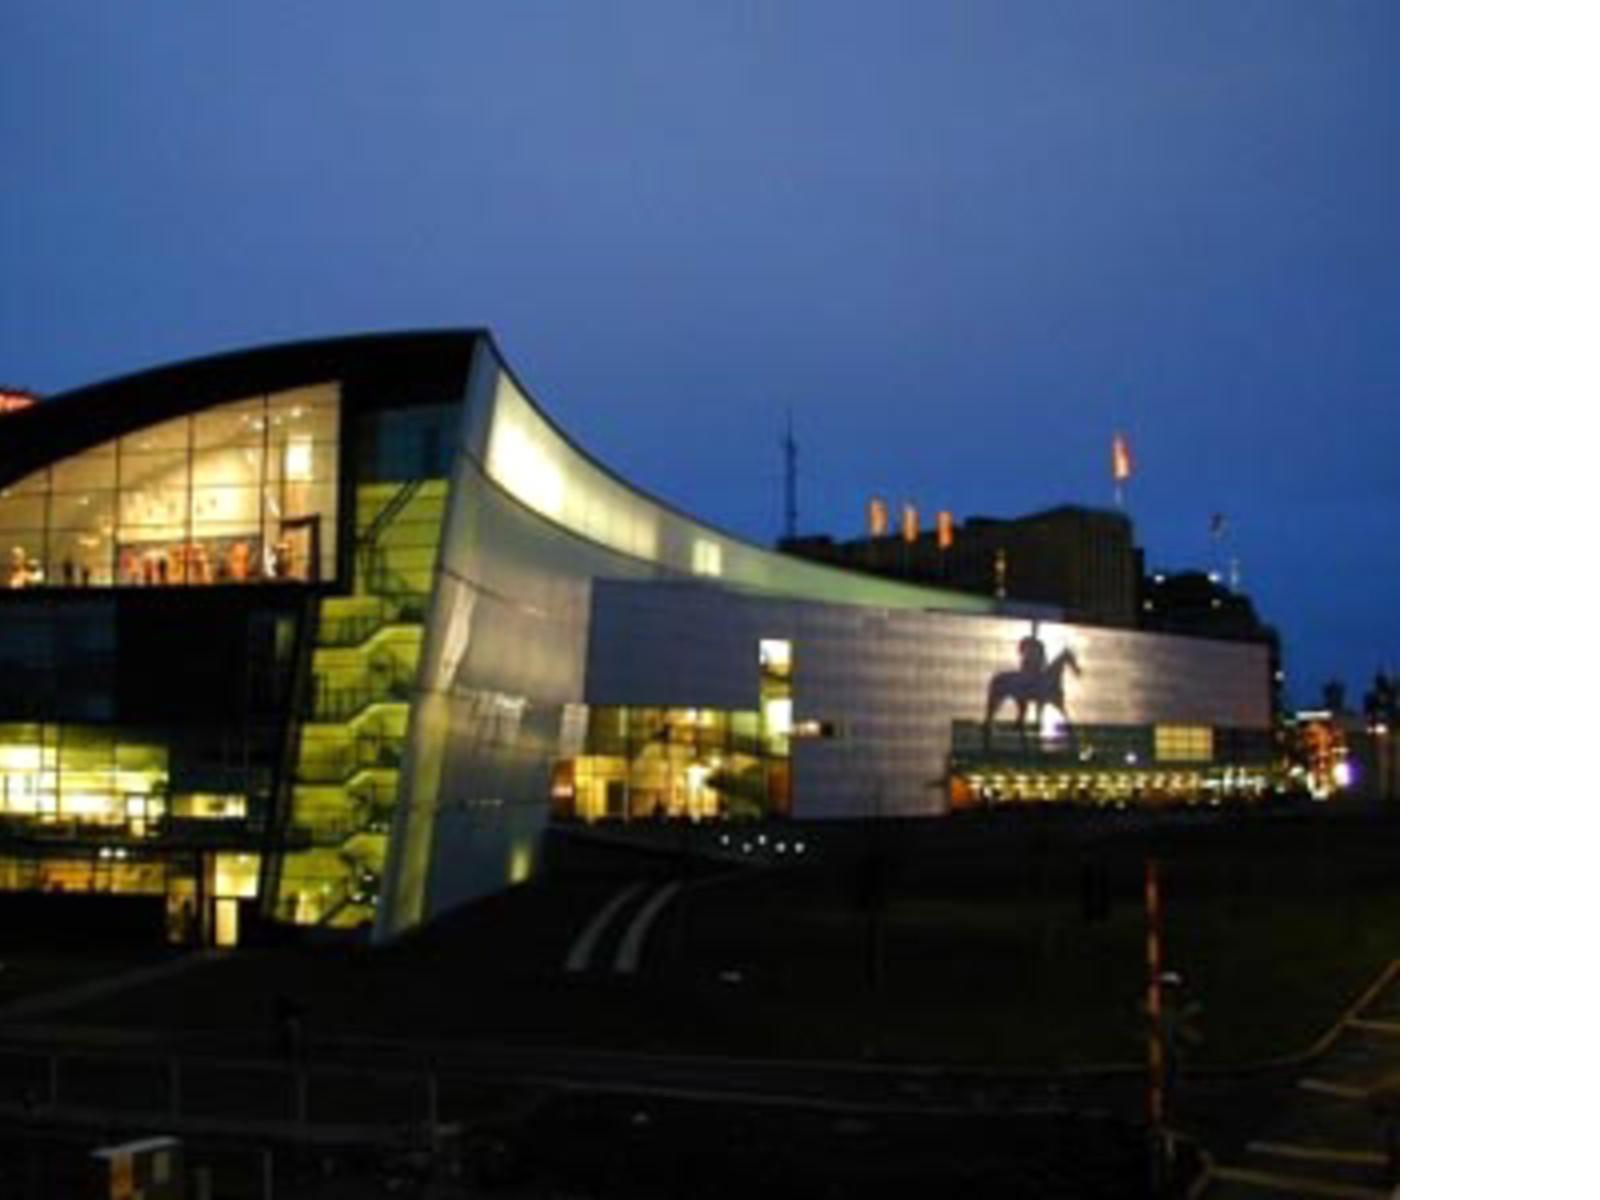 Sinergie compositive ed eleganza urbana nel cuore di Helsinki, Steven Holl